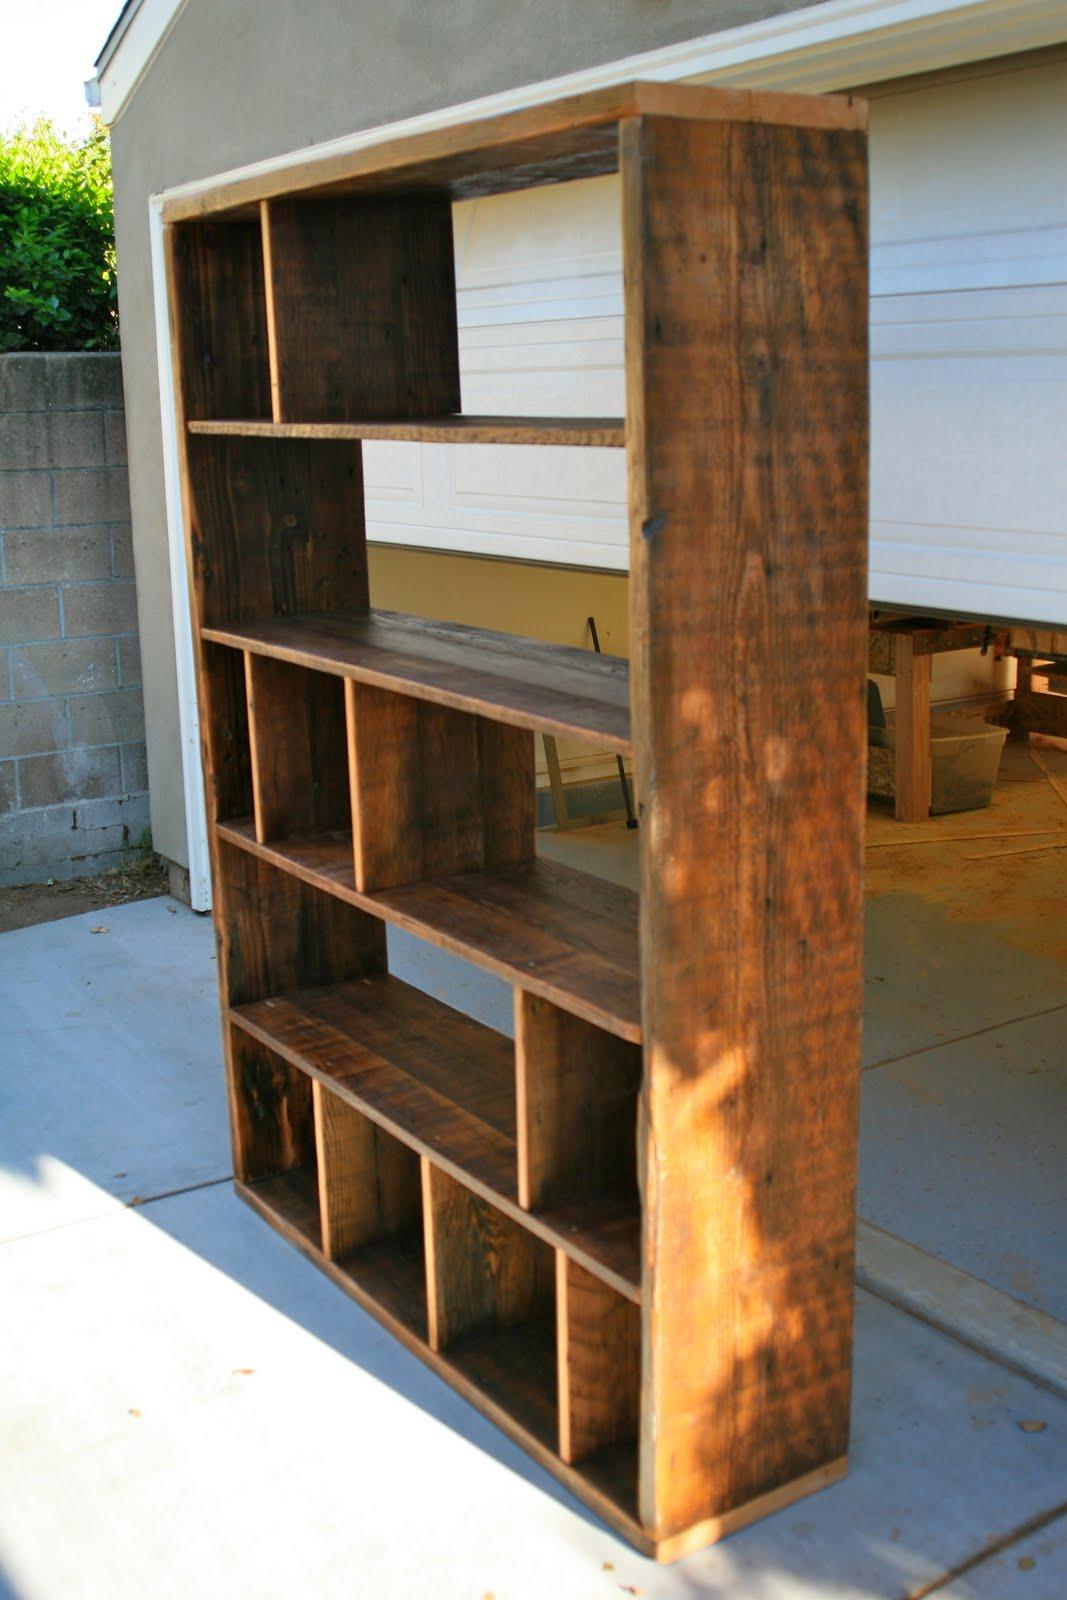 Arbor Exchange   Reclaimed Wood Furniture - Arbor Exchange Reclaimed Wood Furniture: Bookcase